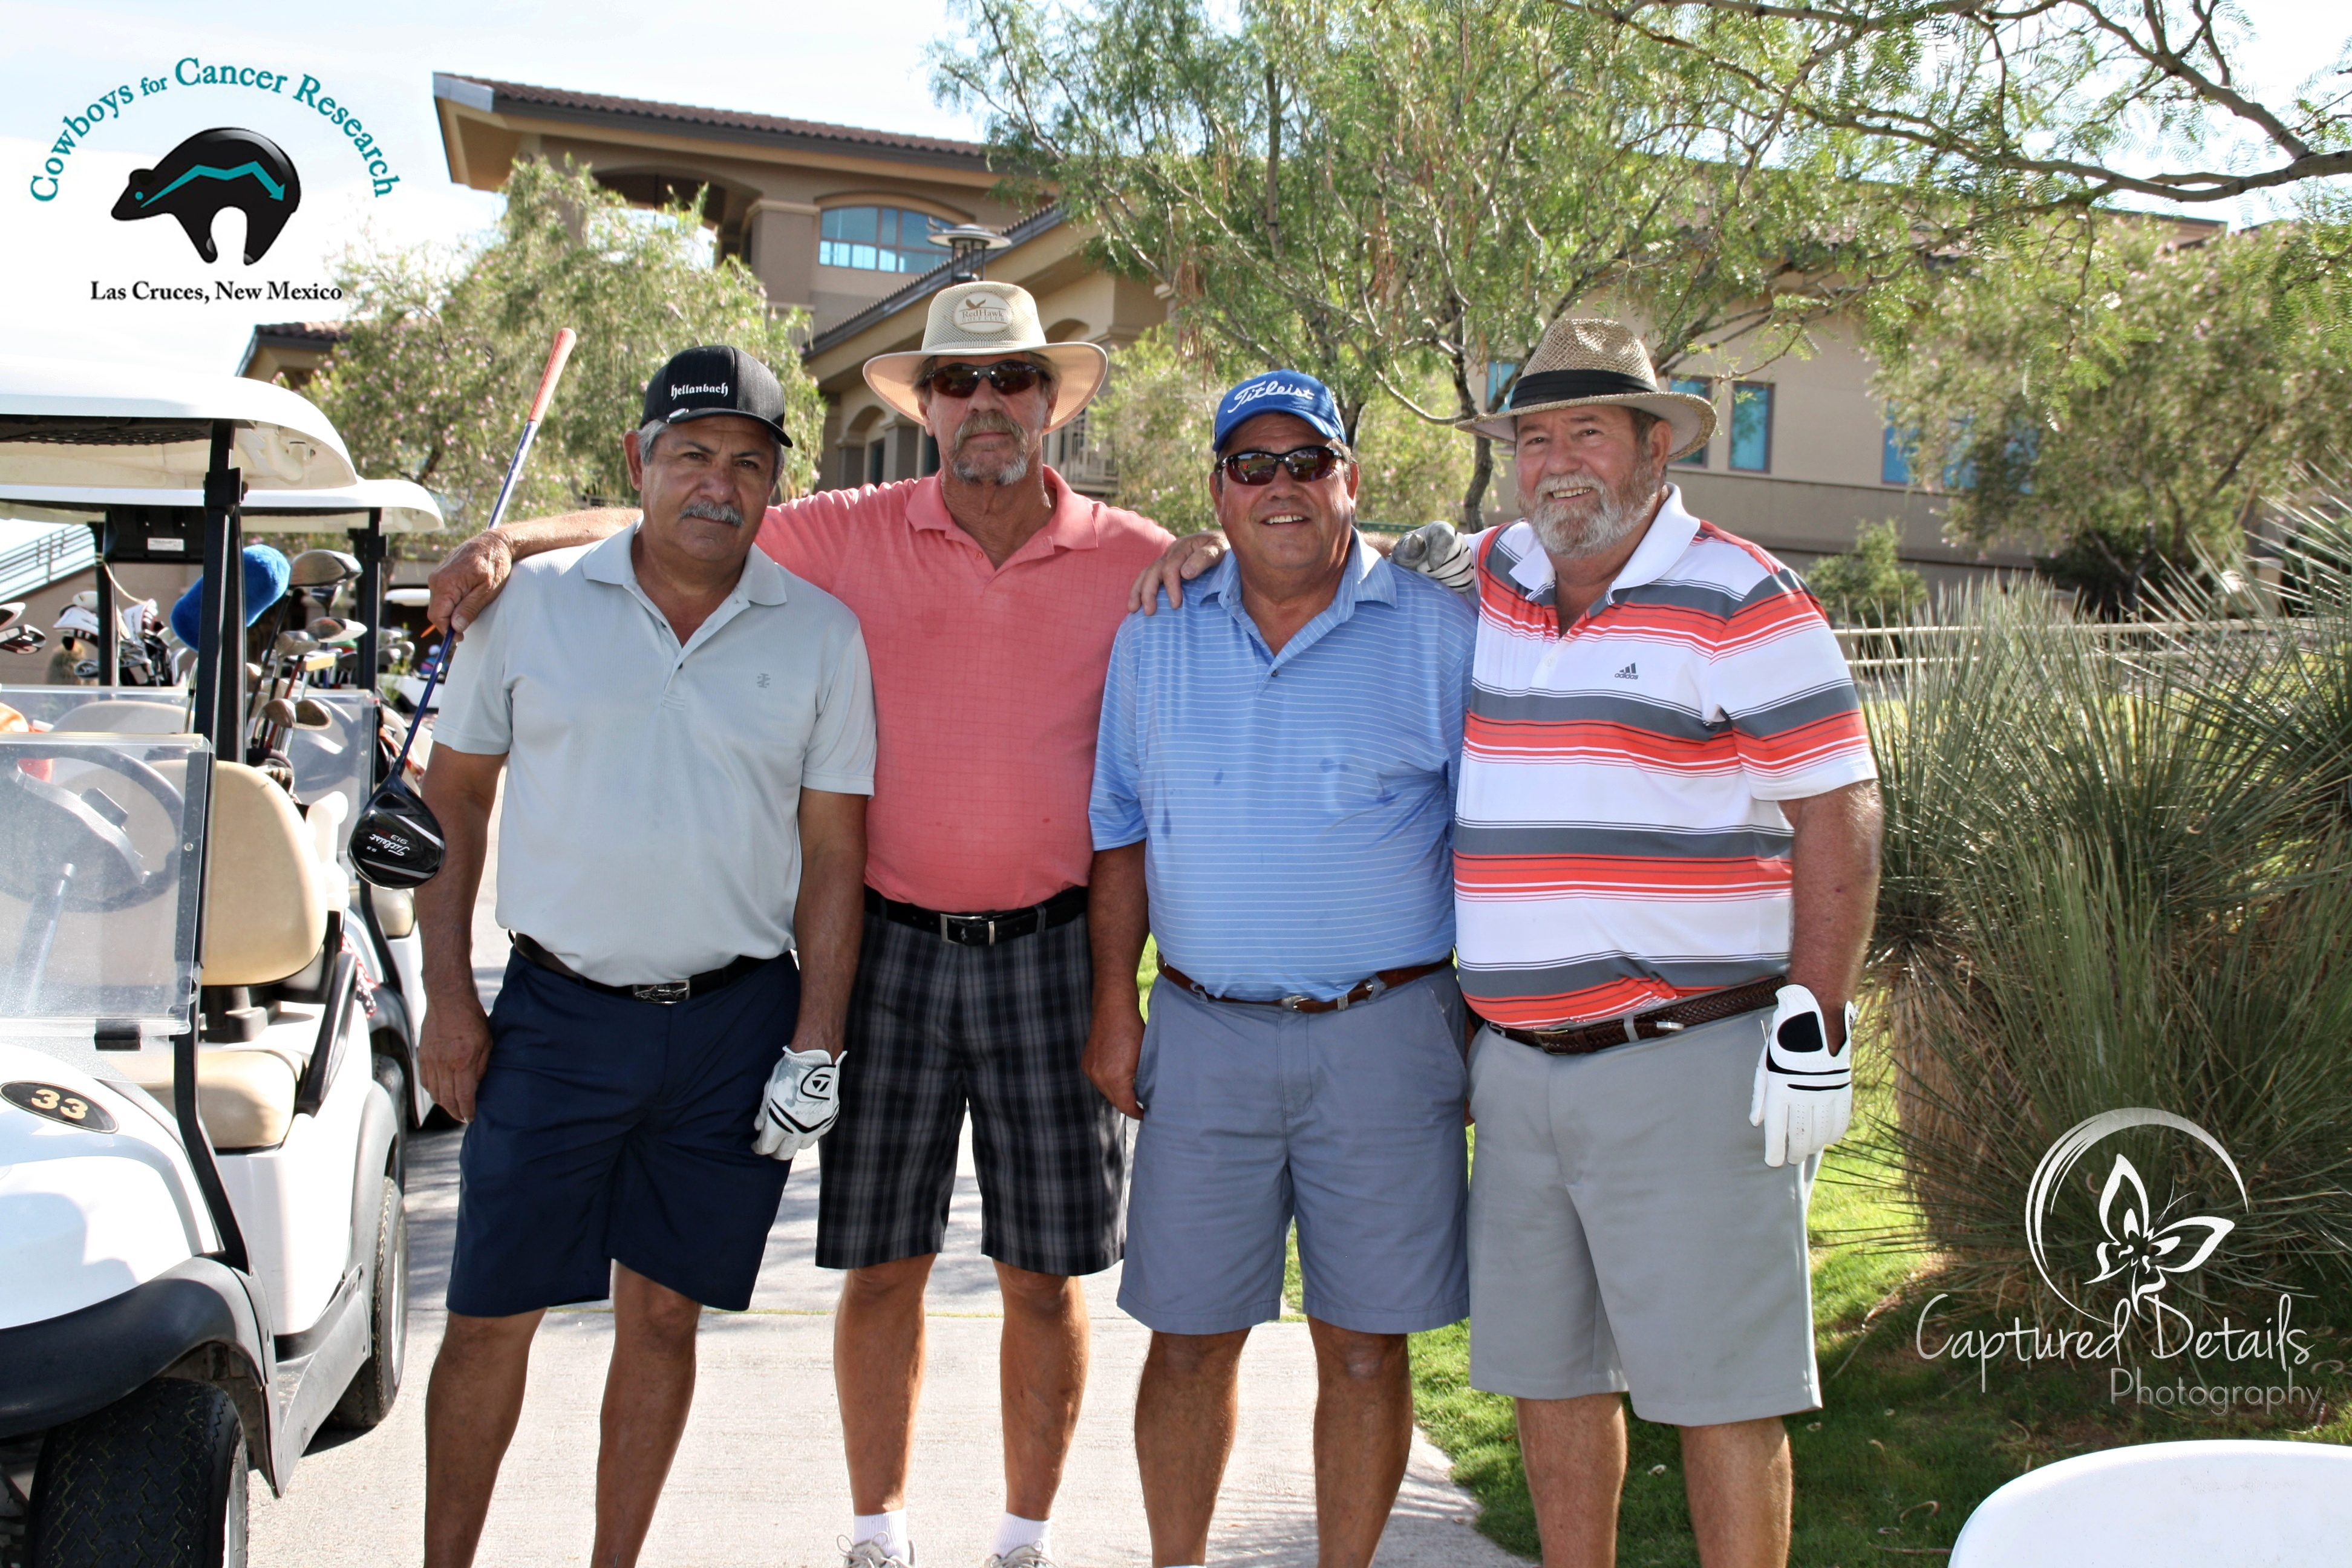 C4CR 2015 Golf Elks Lodge #1119 2nd place morning team.jpg